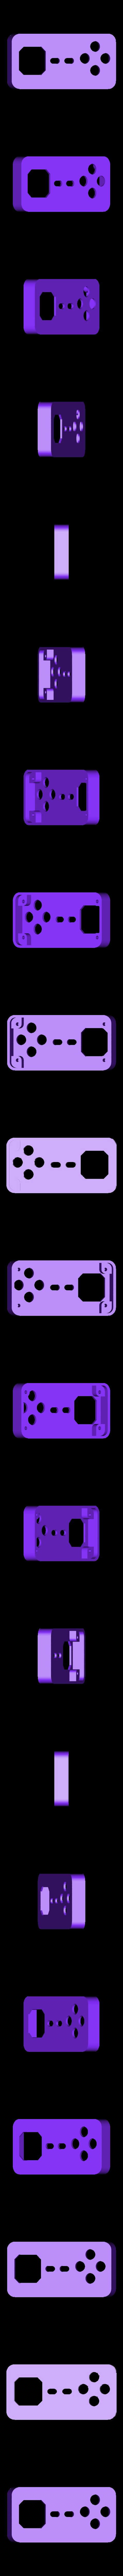 joybon-top.stl Download free STL file Case for Adafruit Joy Bonnet - Raspberry Pi Zero W • 3D printable object, Adafruit